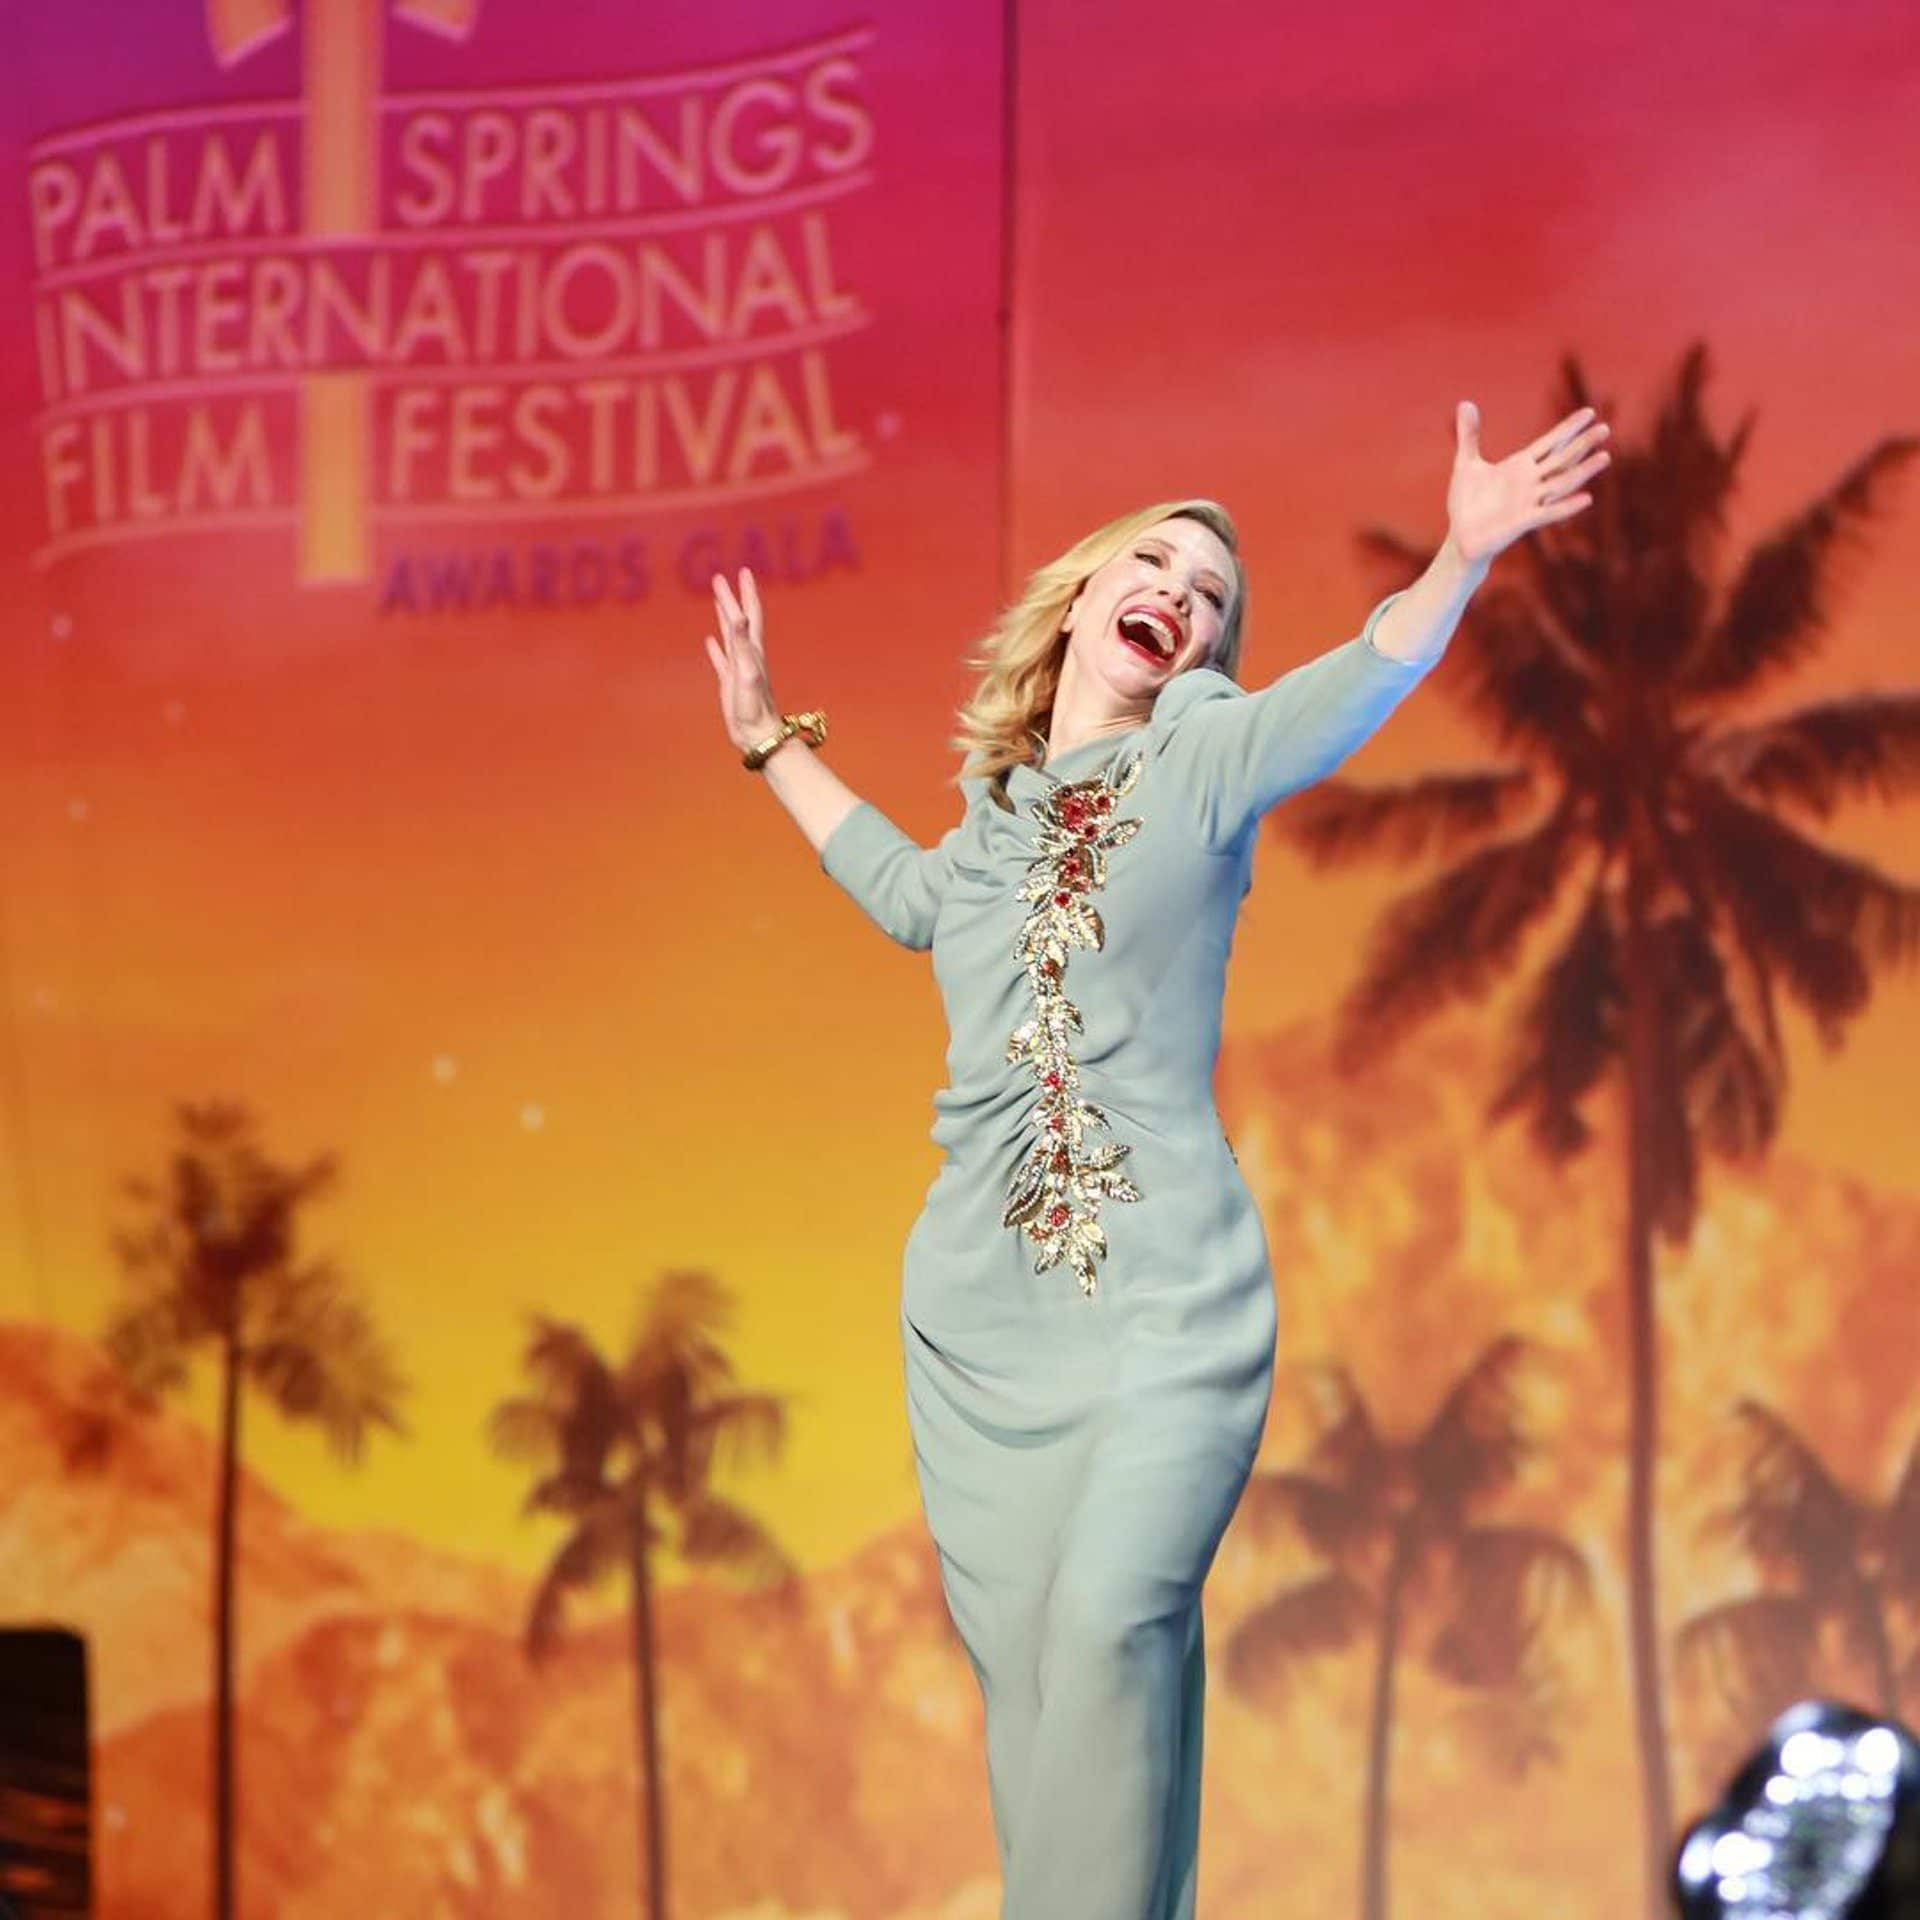 Kate Blanchet at Palm Springs Film Festival